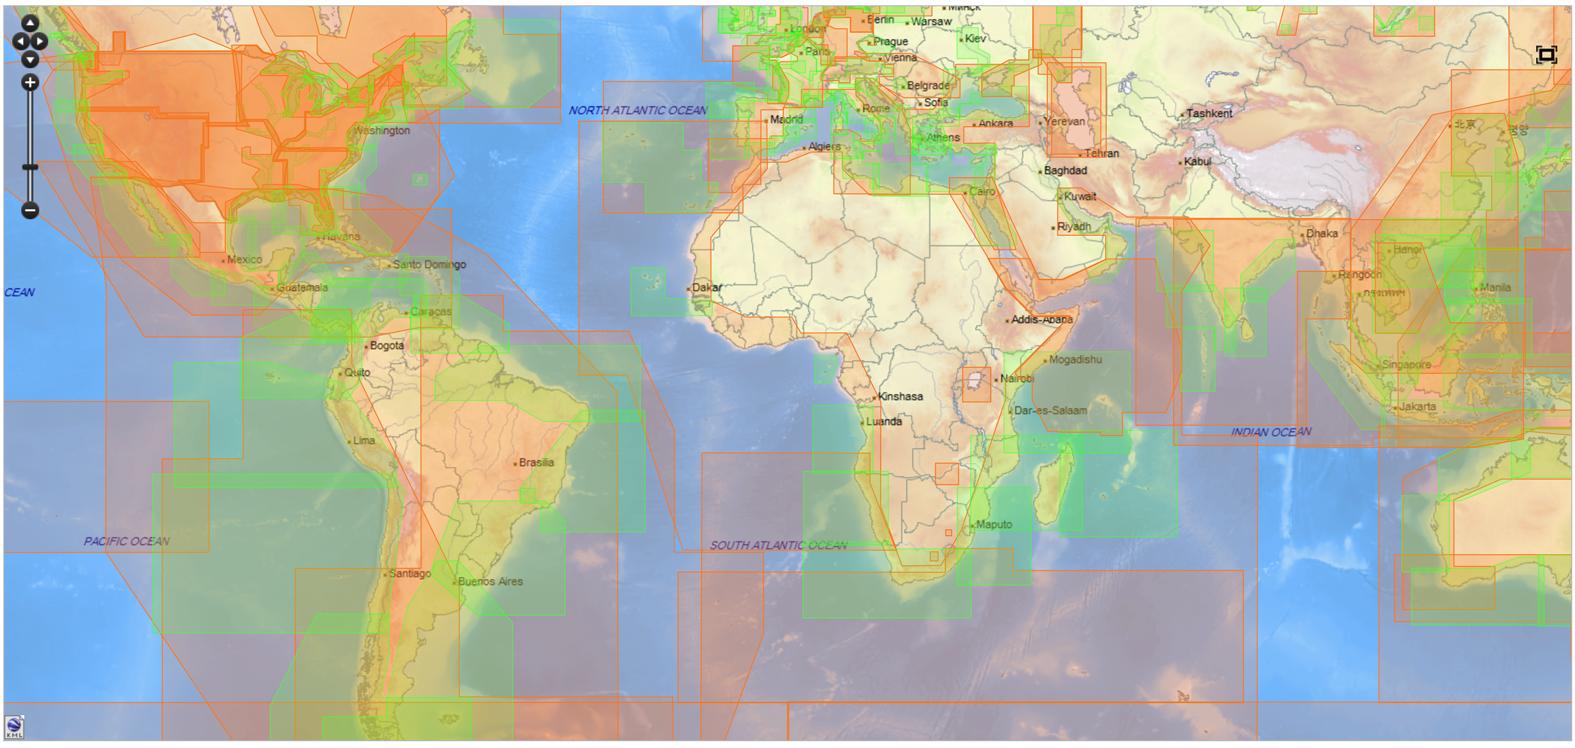 Cobertura mundial C-map